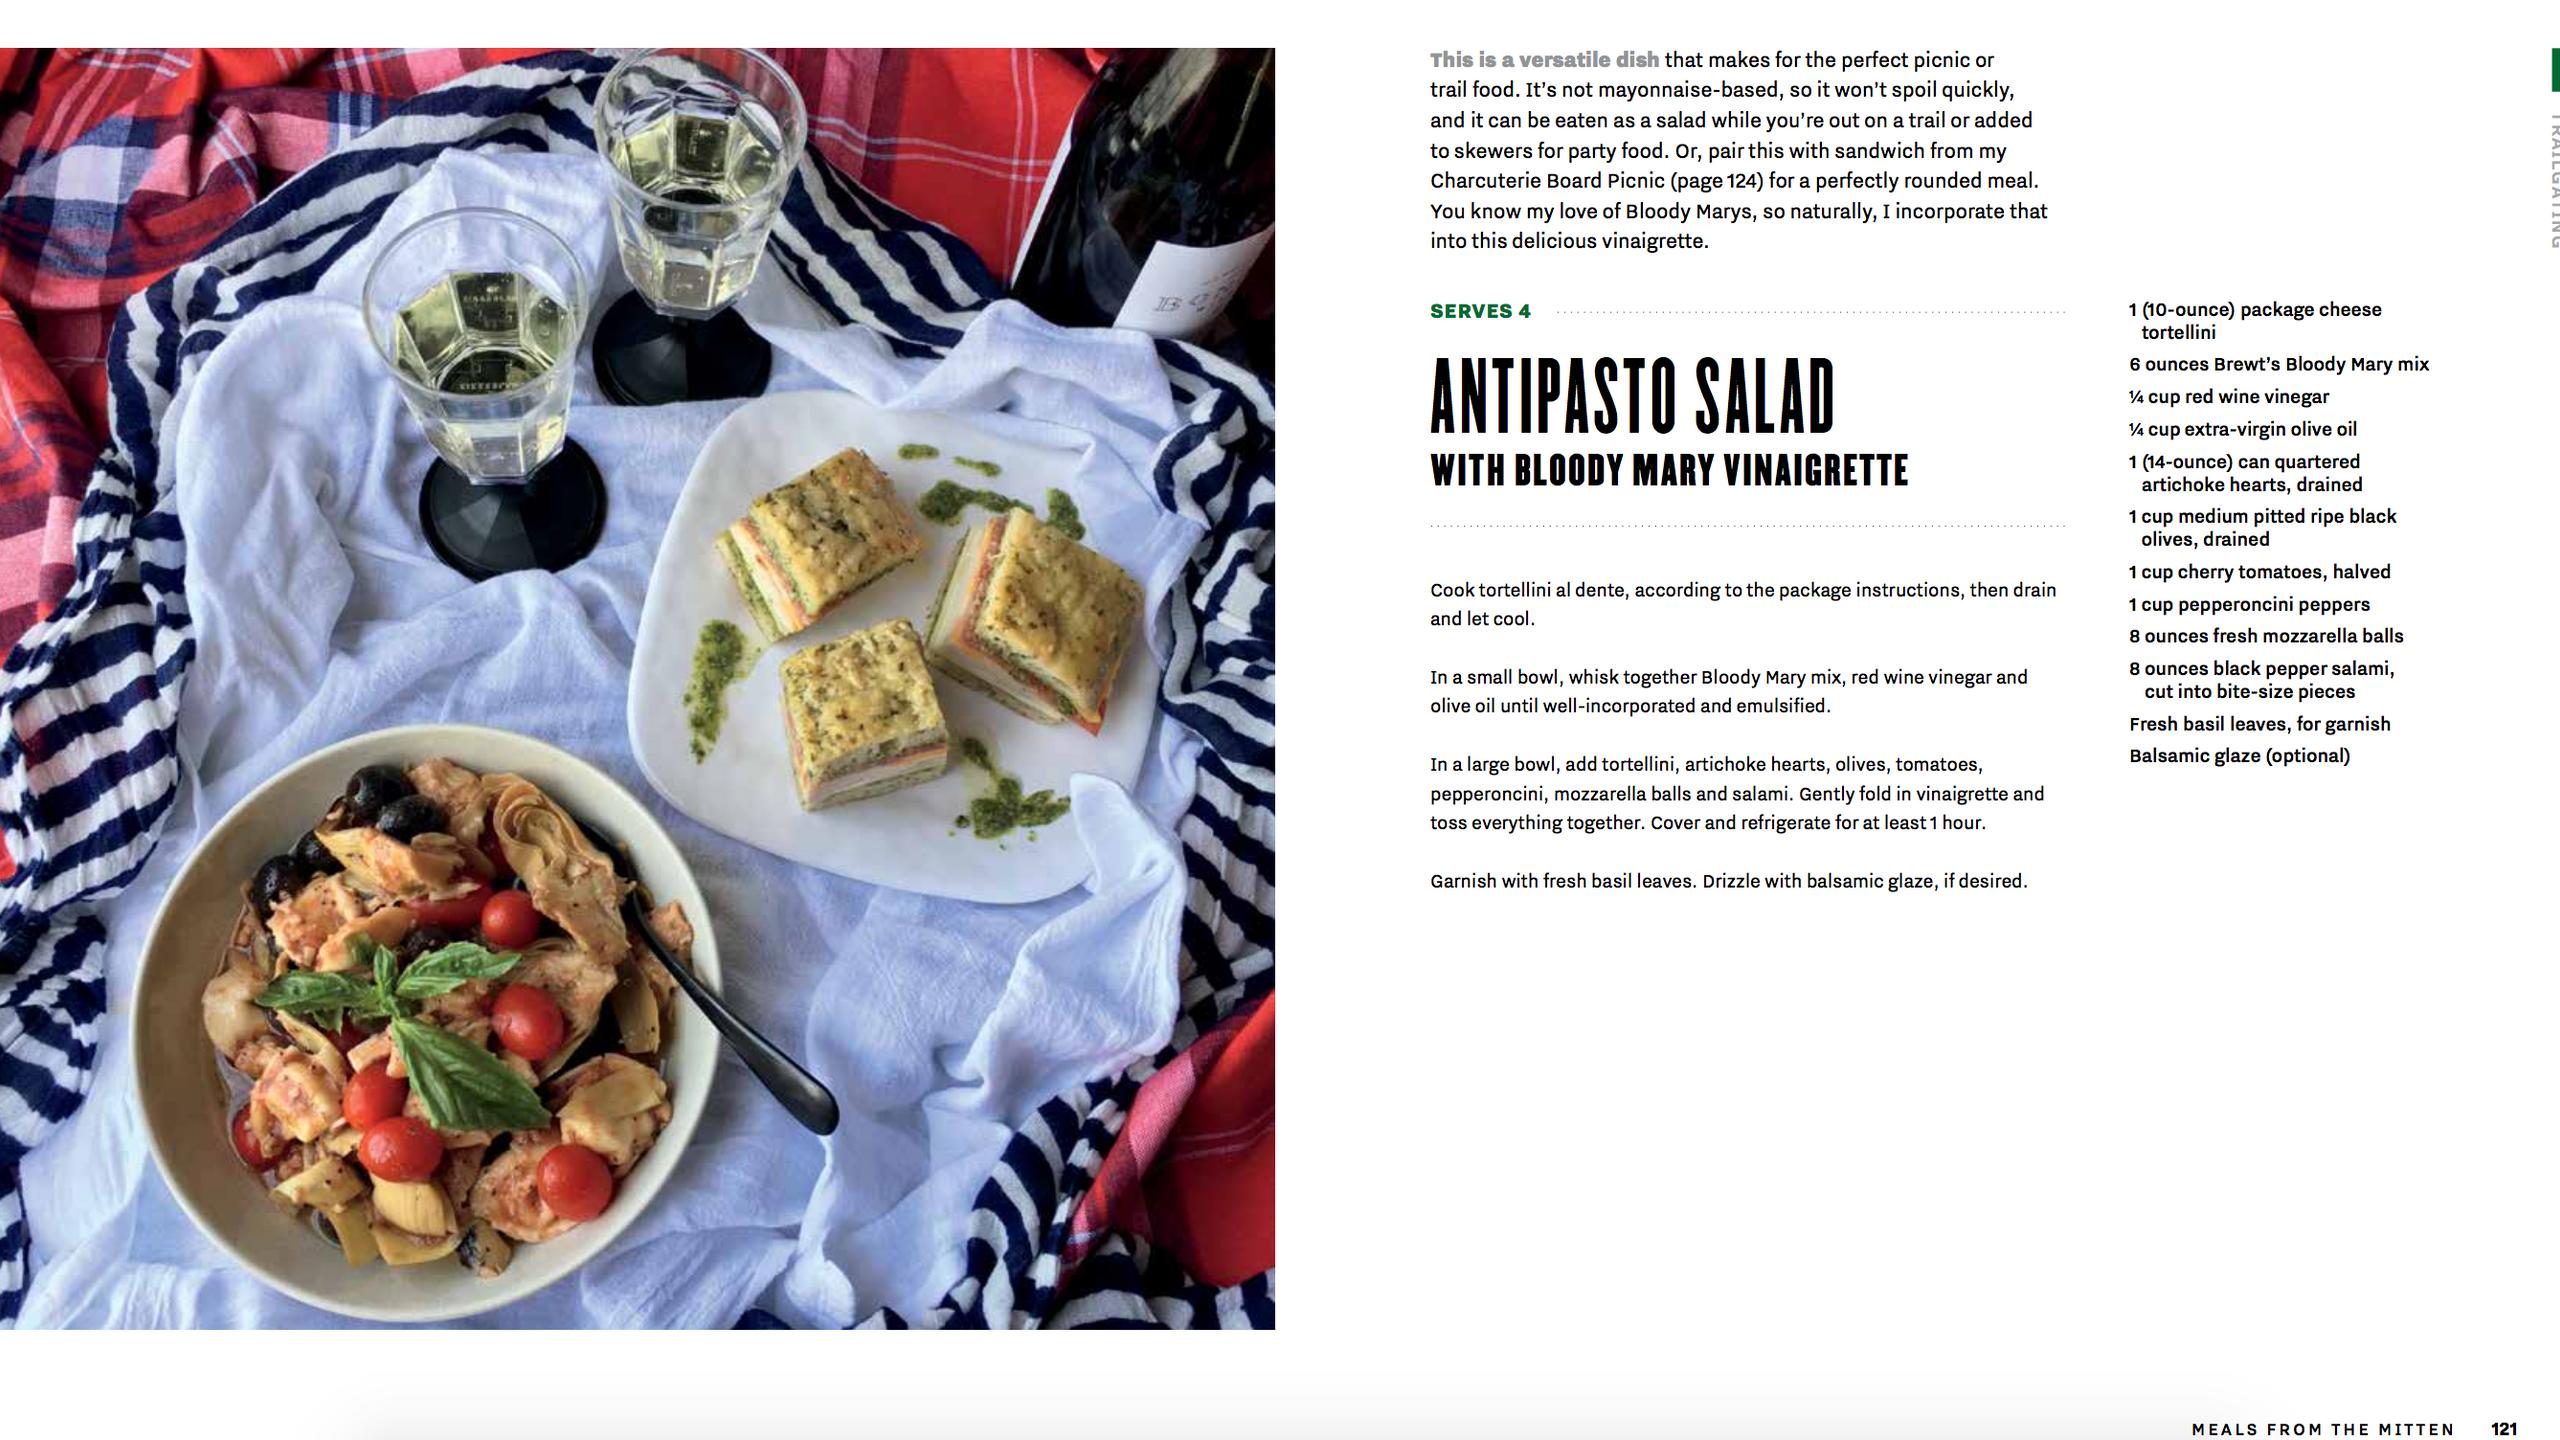 Antipasto Salad with Bloody Mary Vinaigr